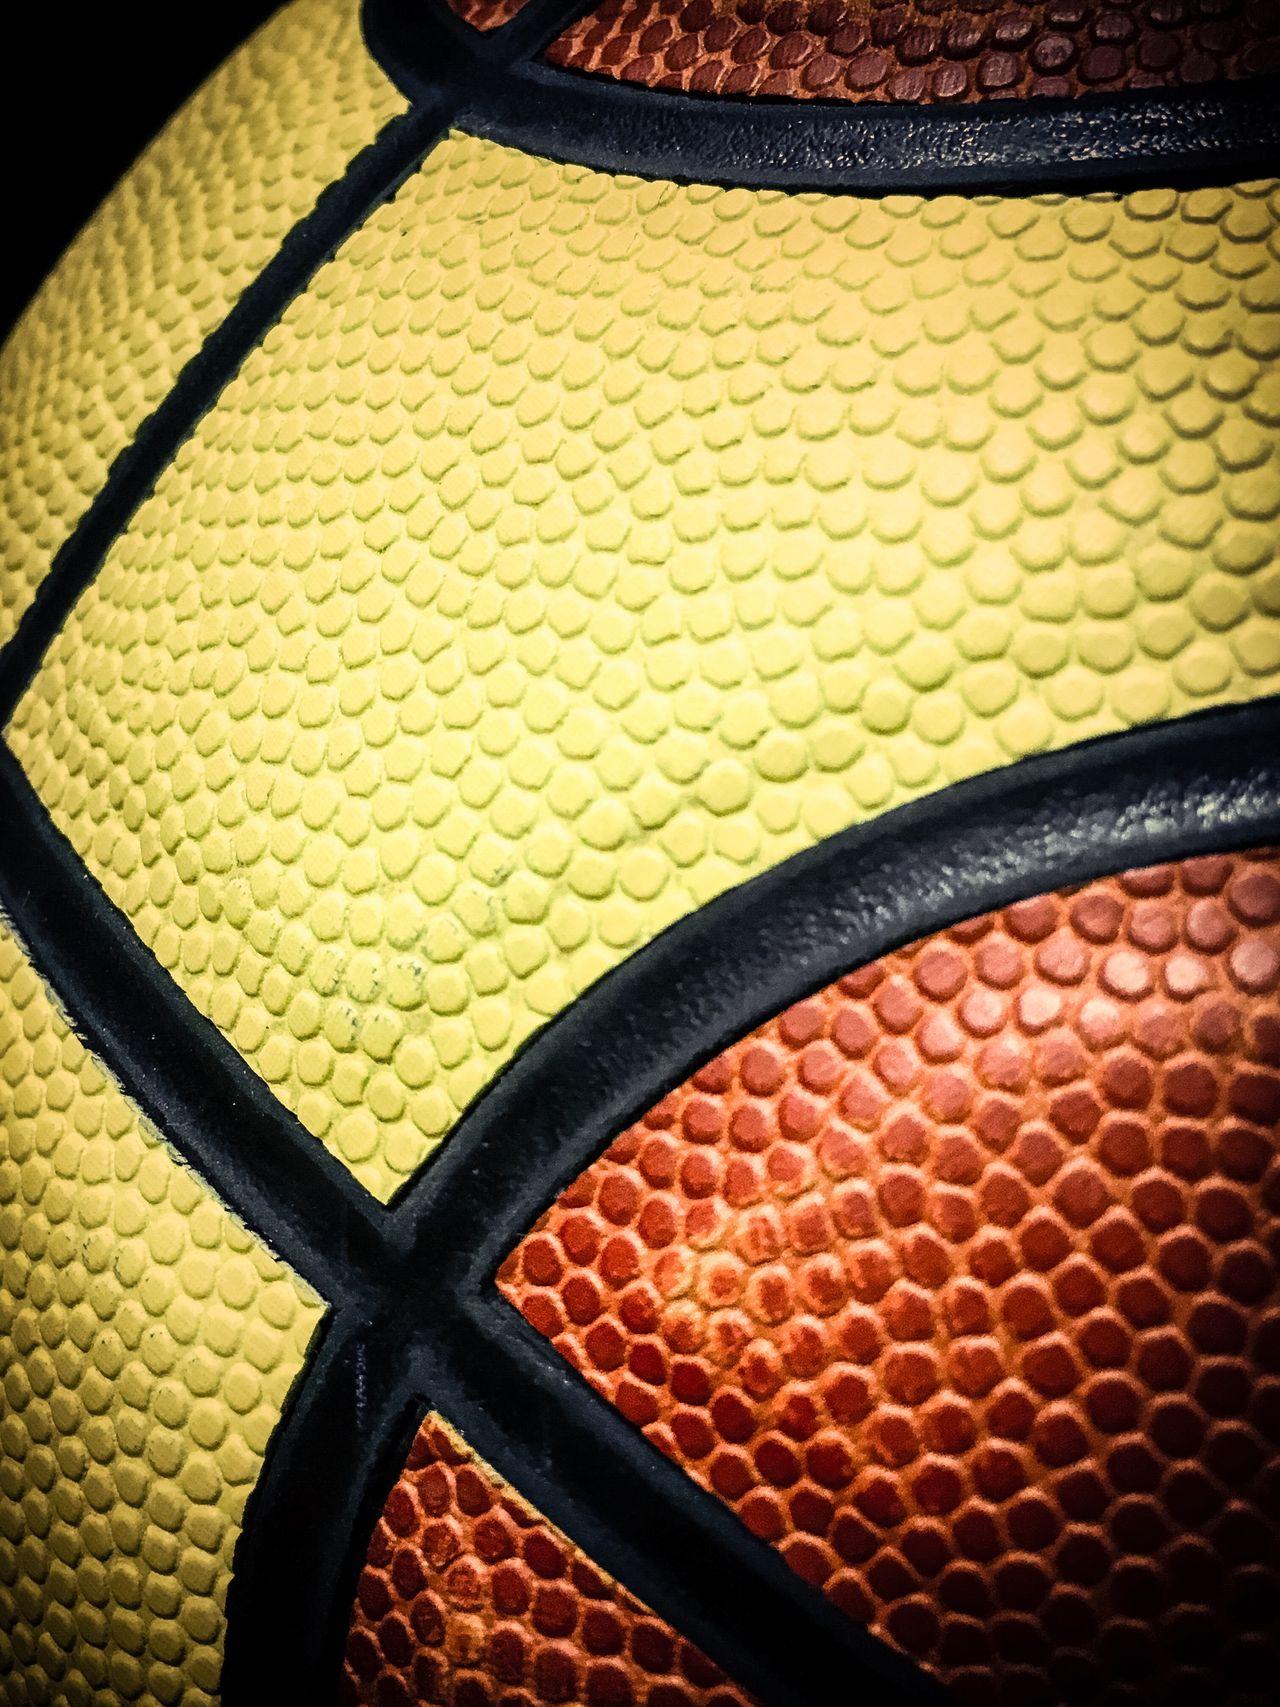 Lines of basketball Ball Basket Basketball Basketball Is Life Basketball ❤ Detail Game Ball Leather Legnano Basket Knights Molten No People Pallacanestro Pallone Pelle Still Life